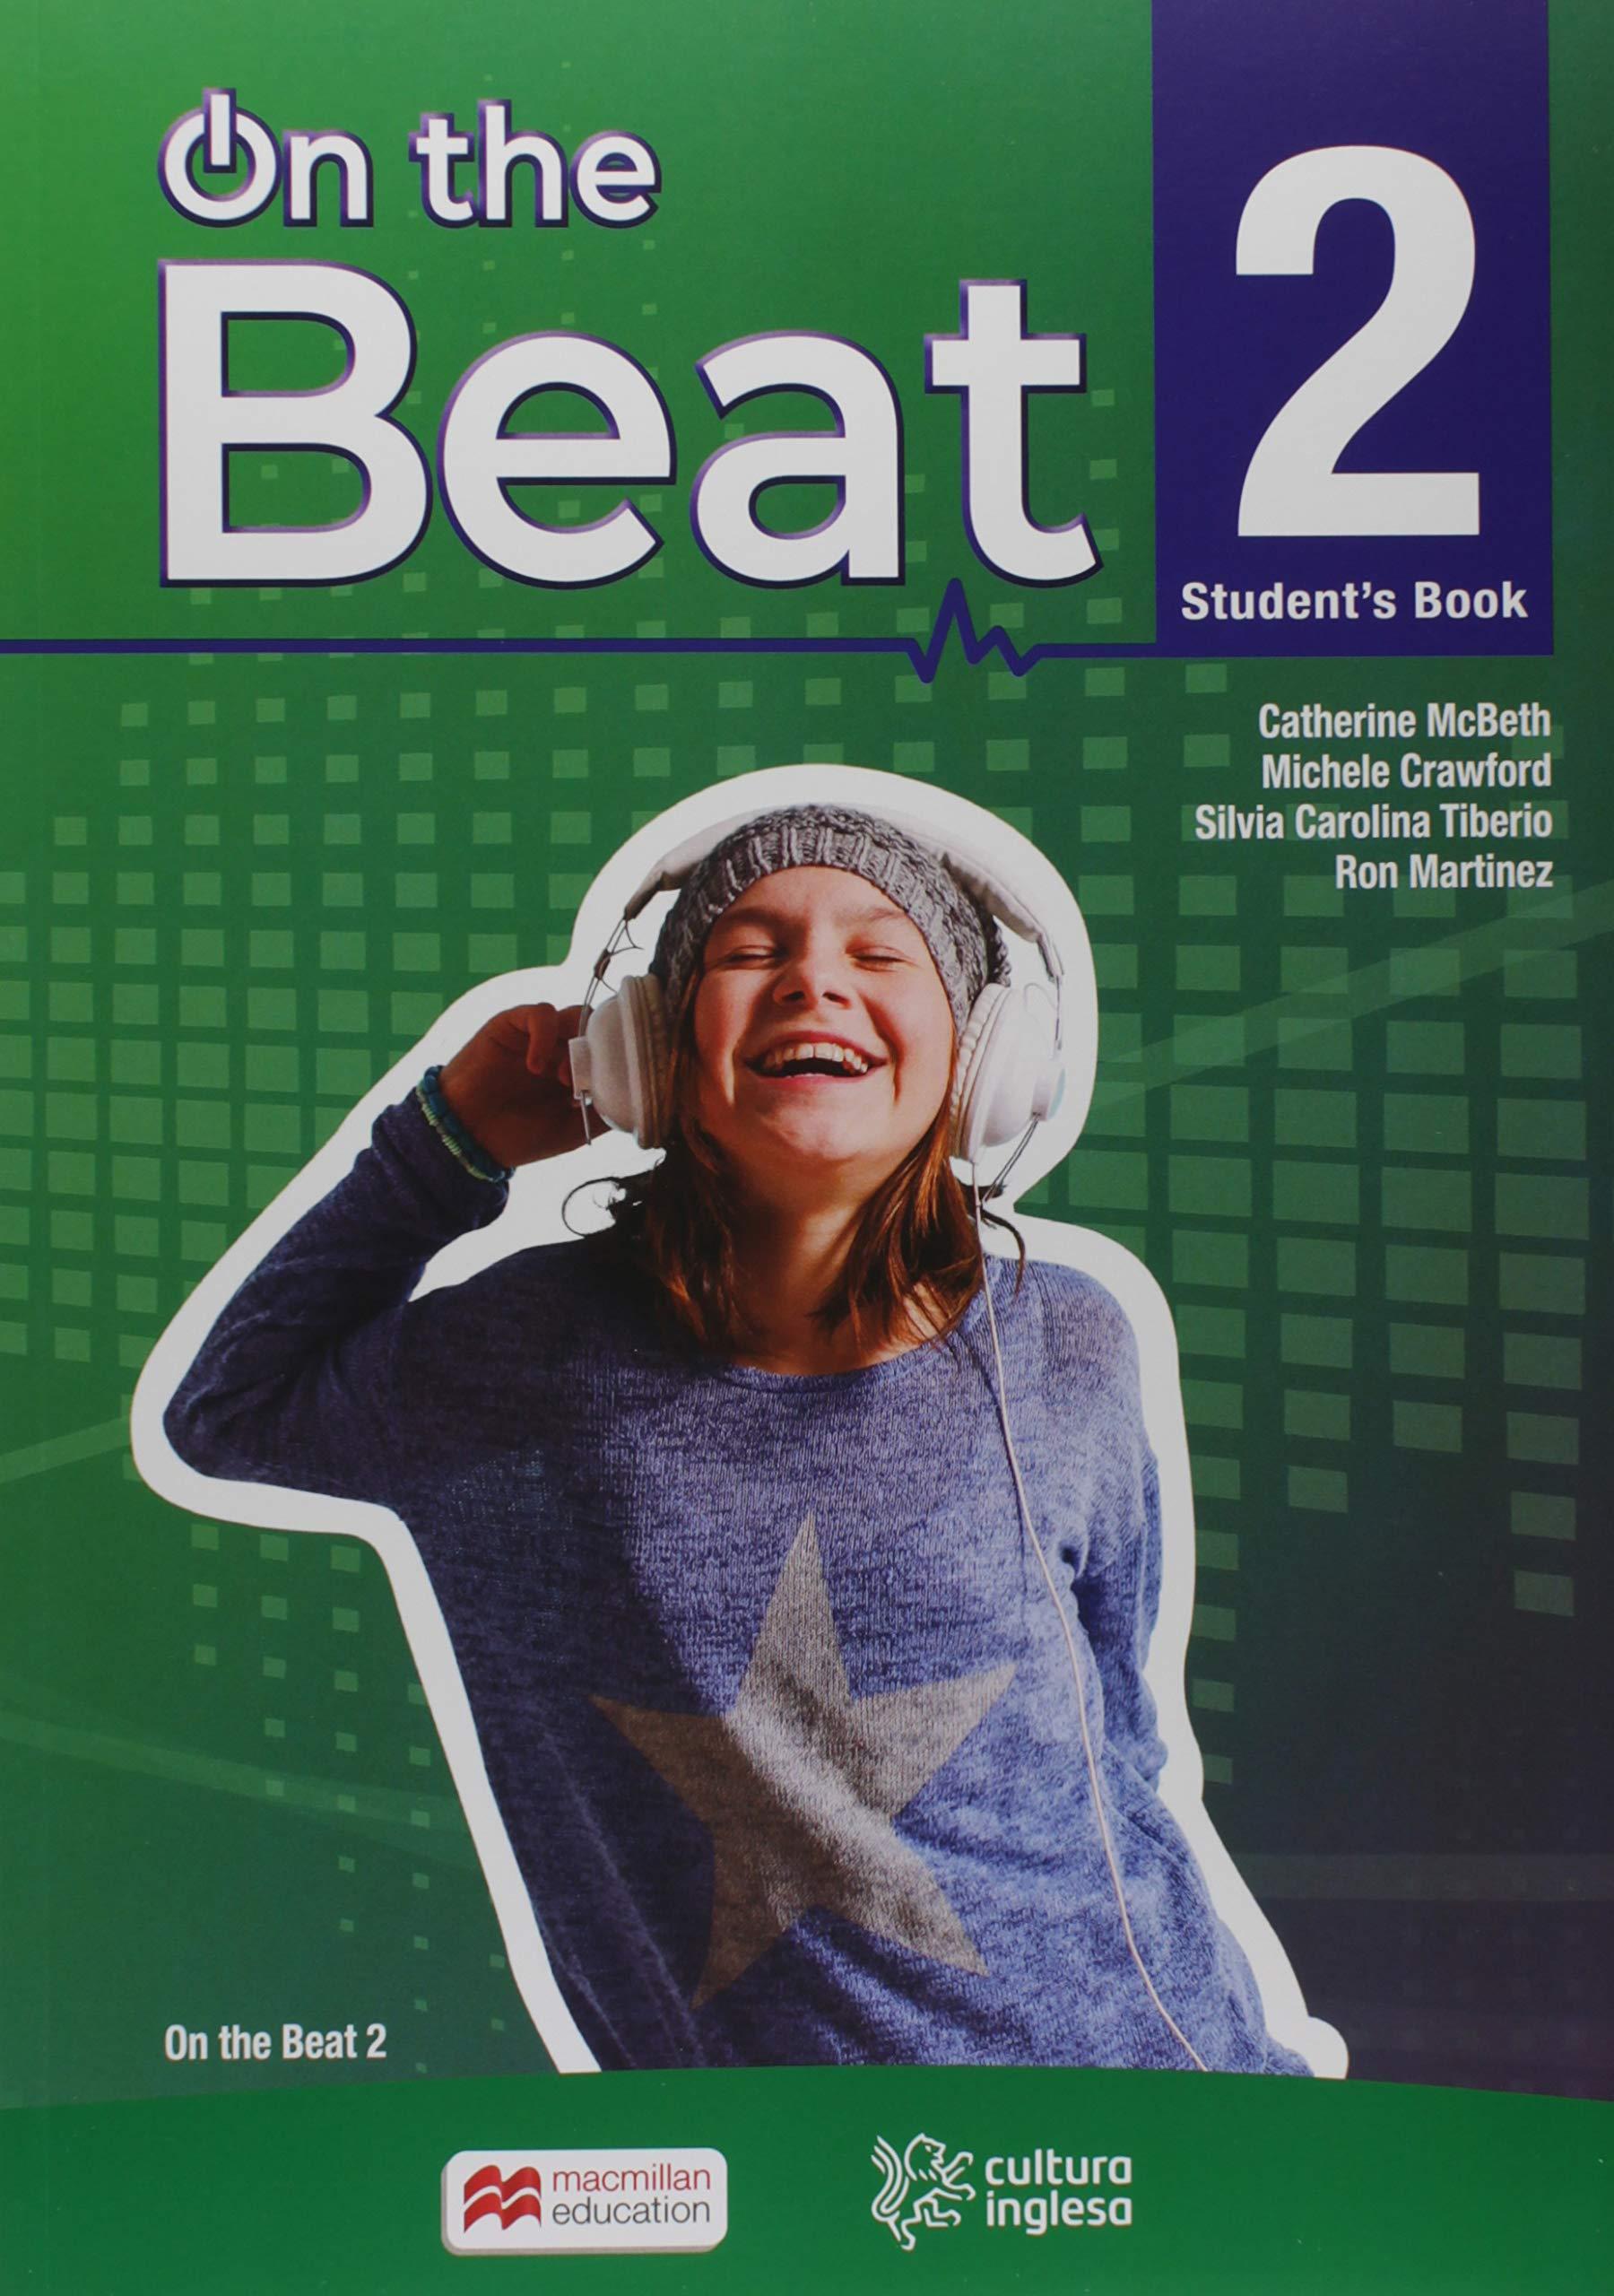 Cisp - on the Beat StudentS Book-2: Amazon.es: Ron Martinez ...